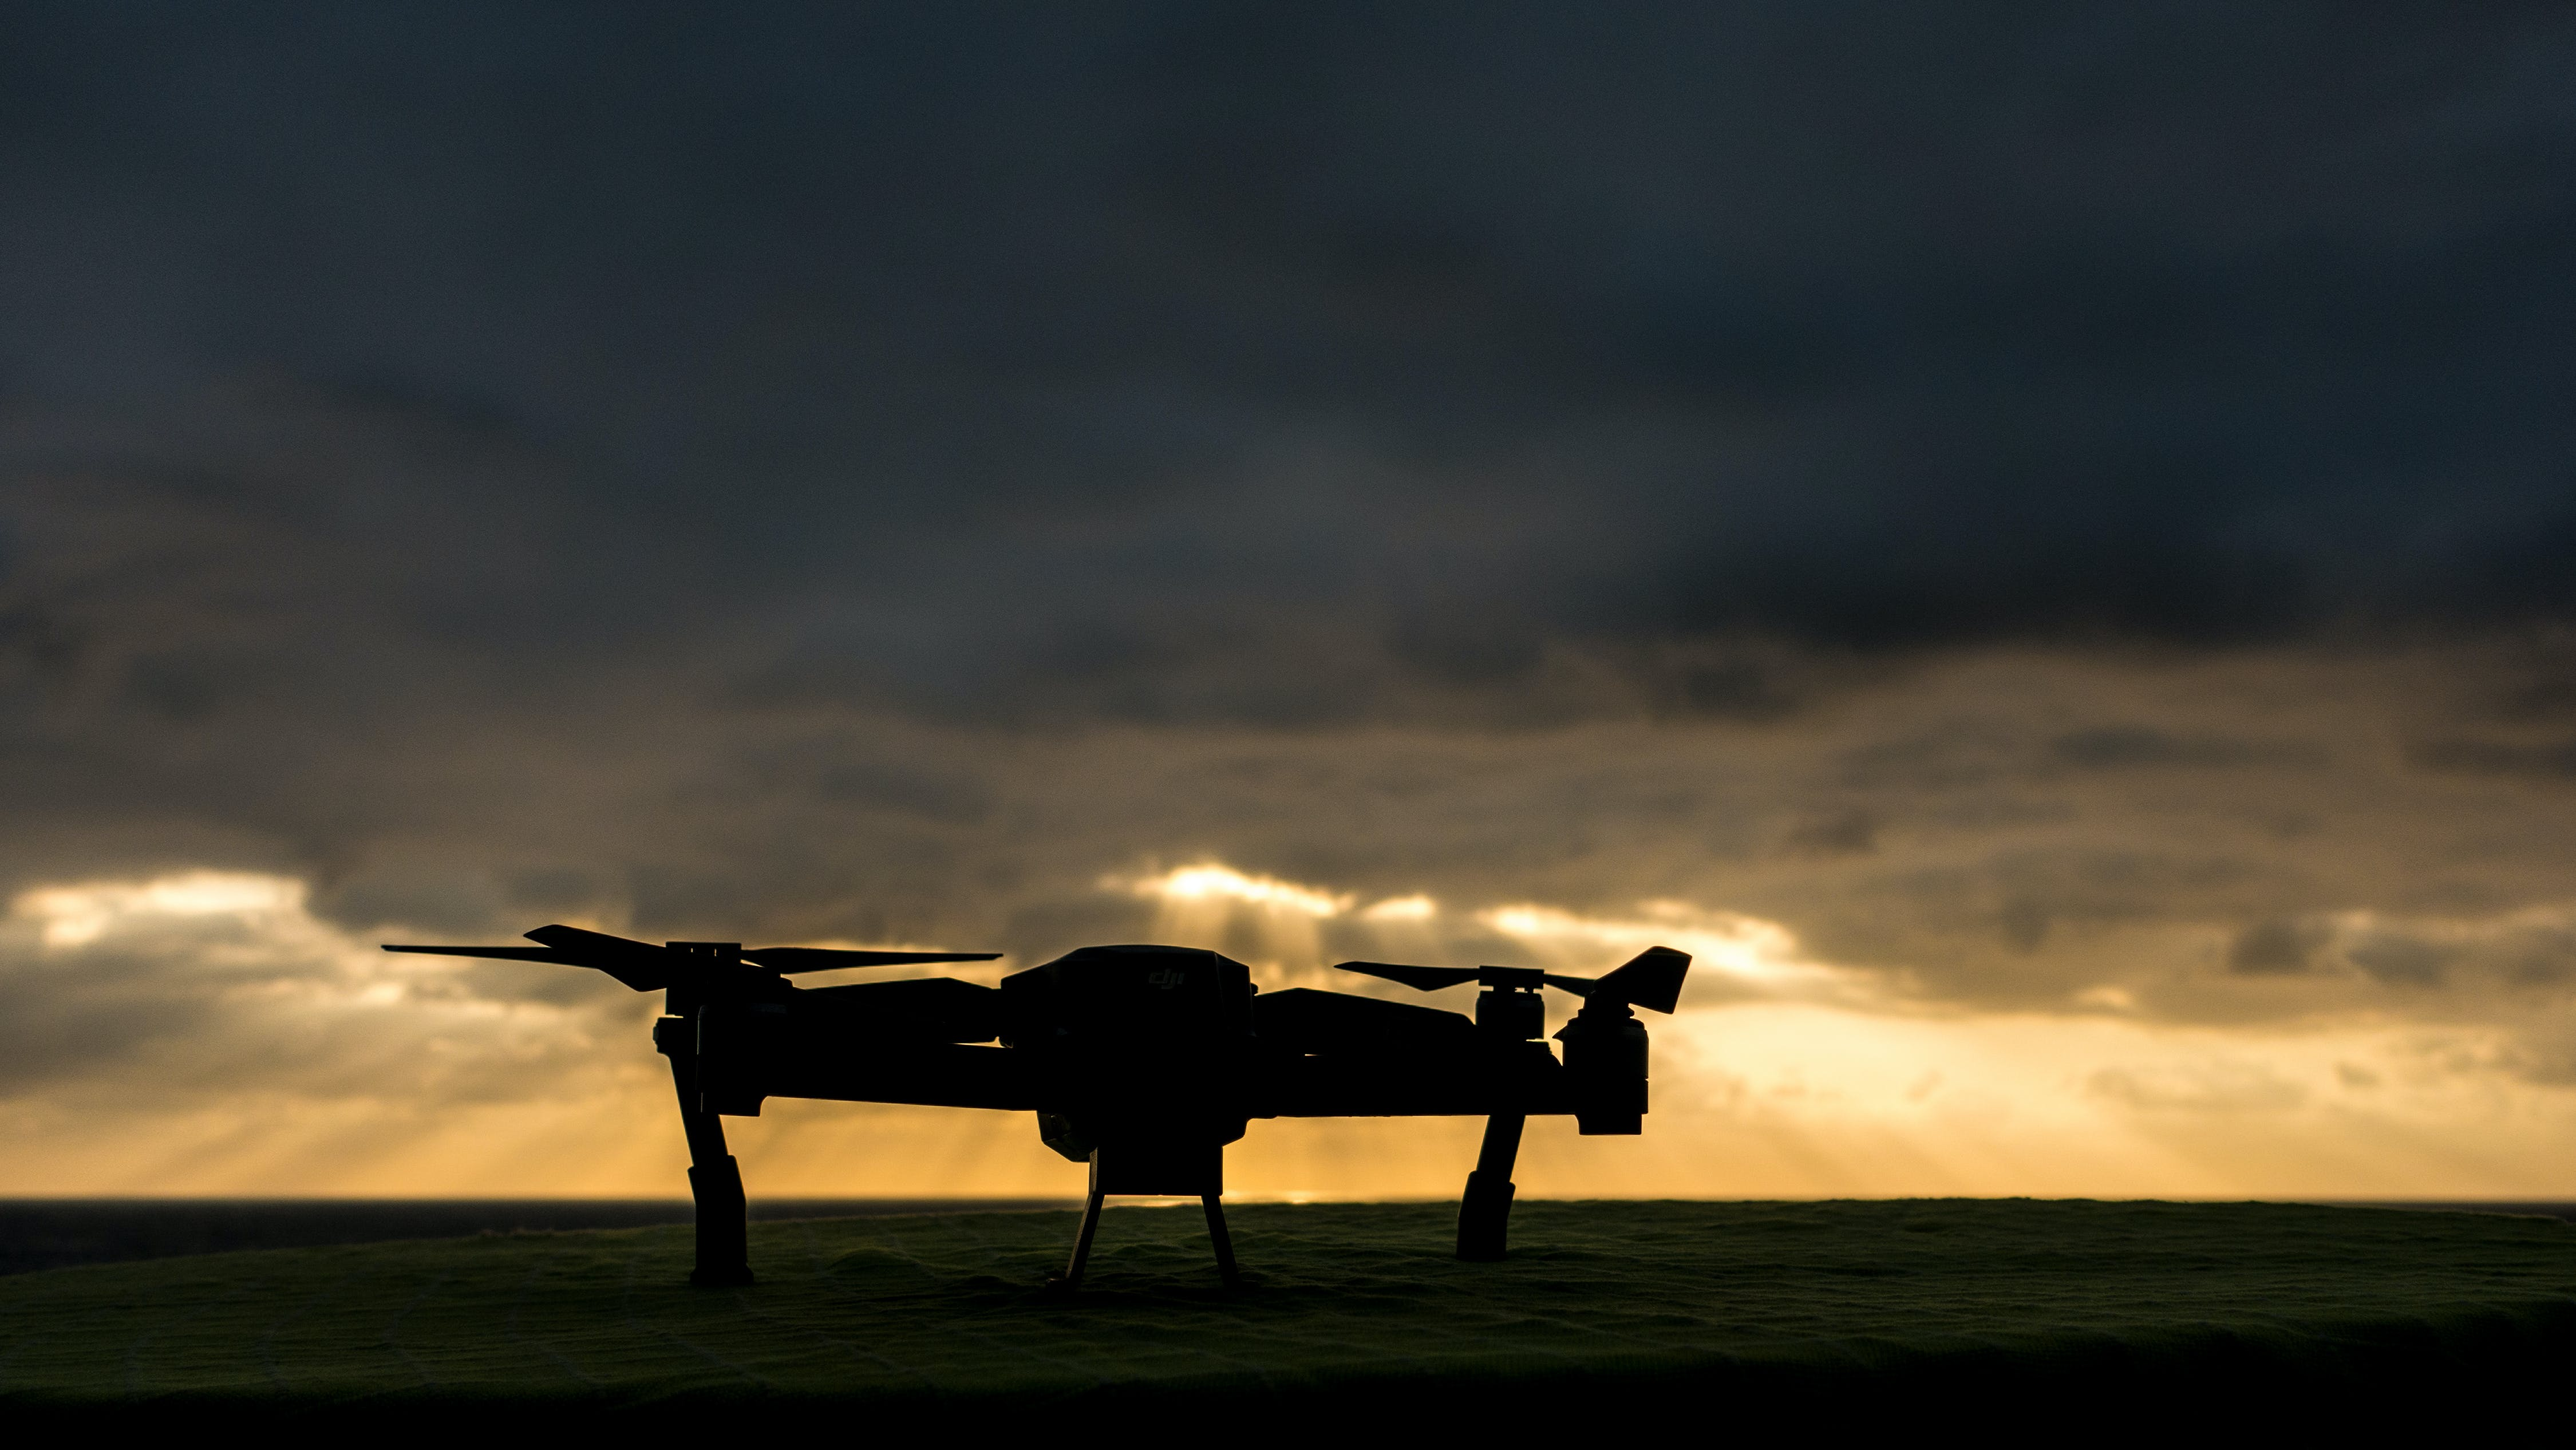 Free stock photo of cloudy sky, drone, drone sunset, mavic pro